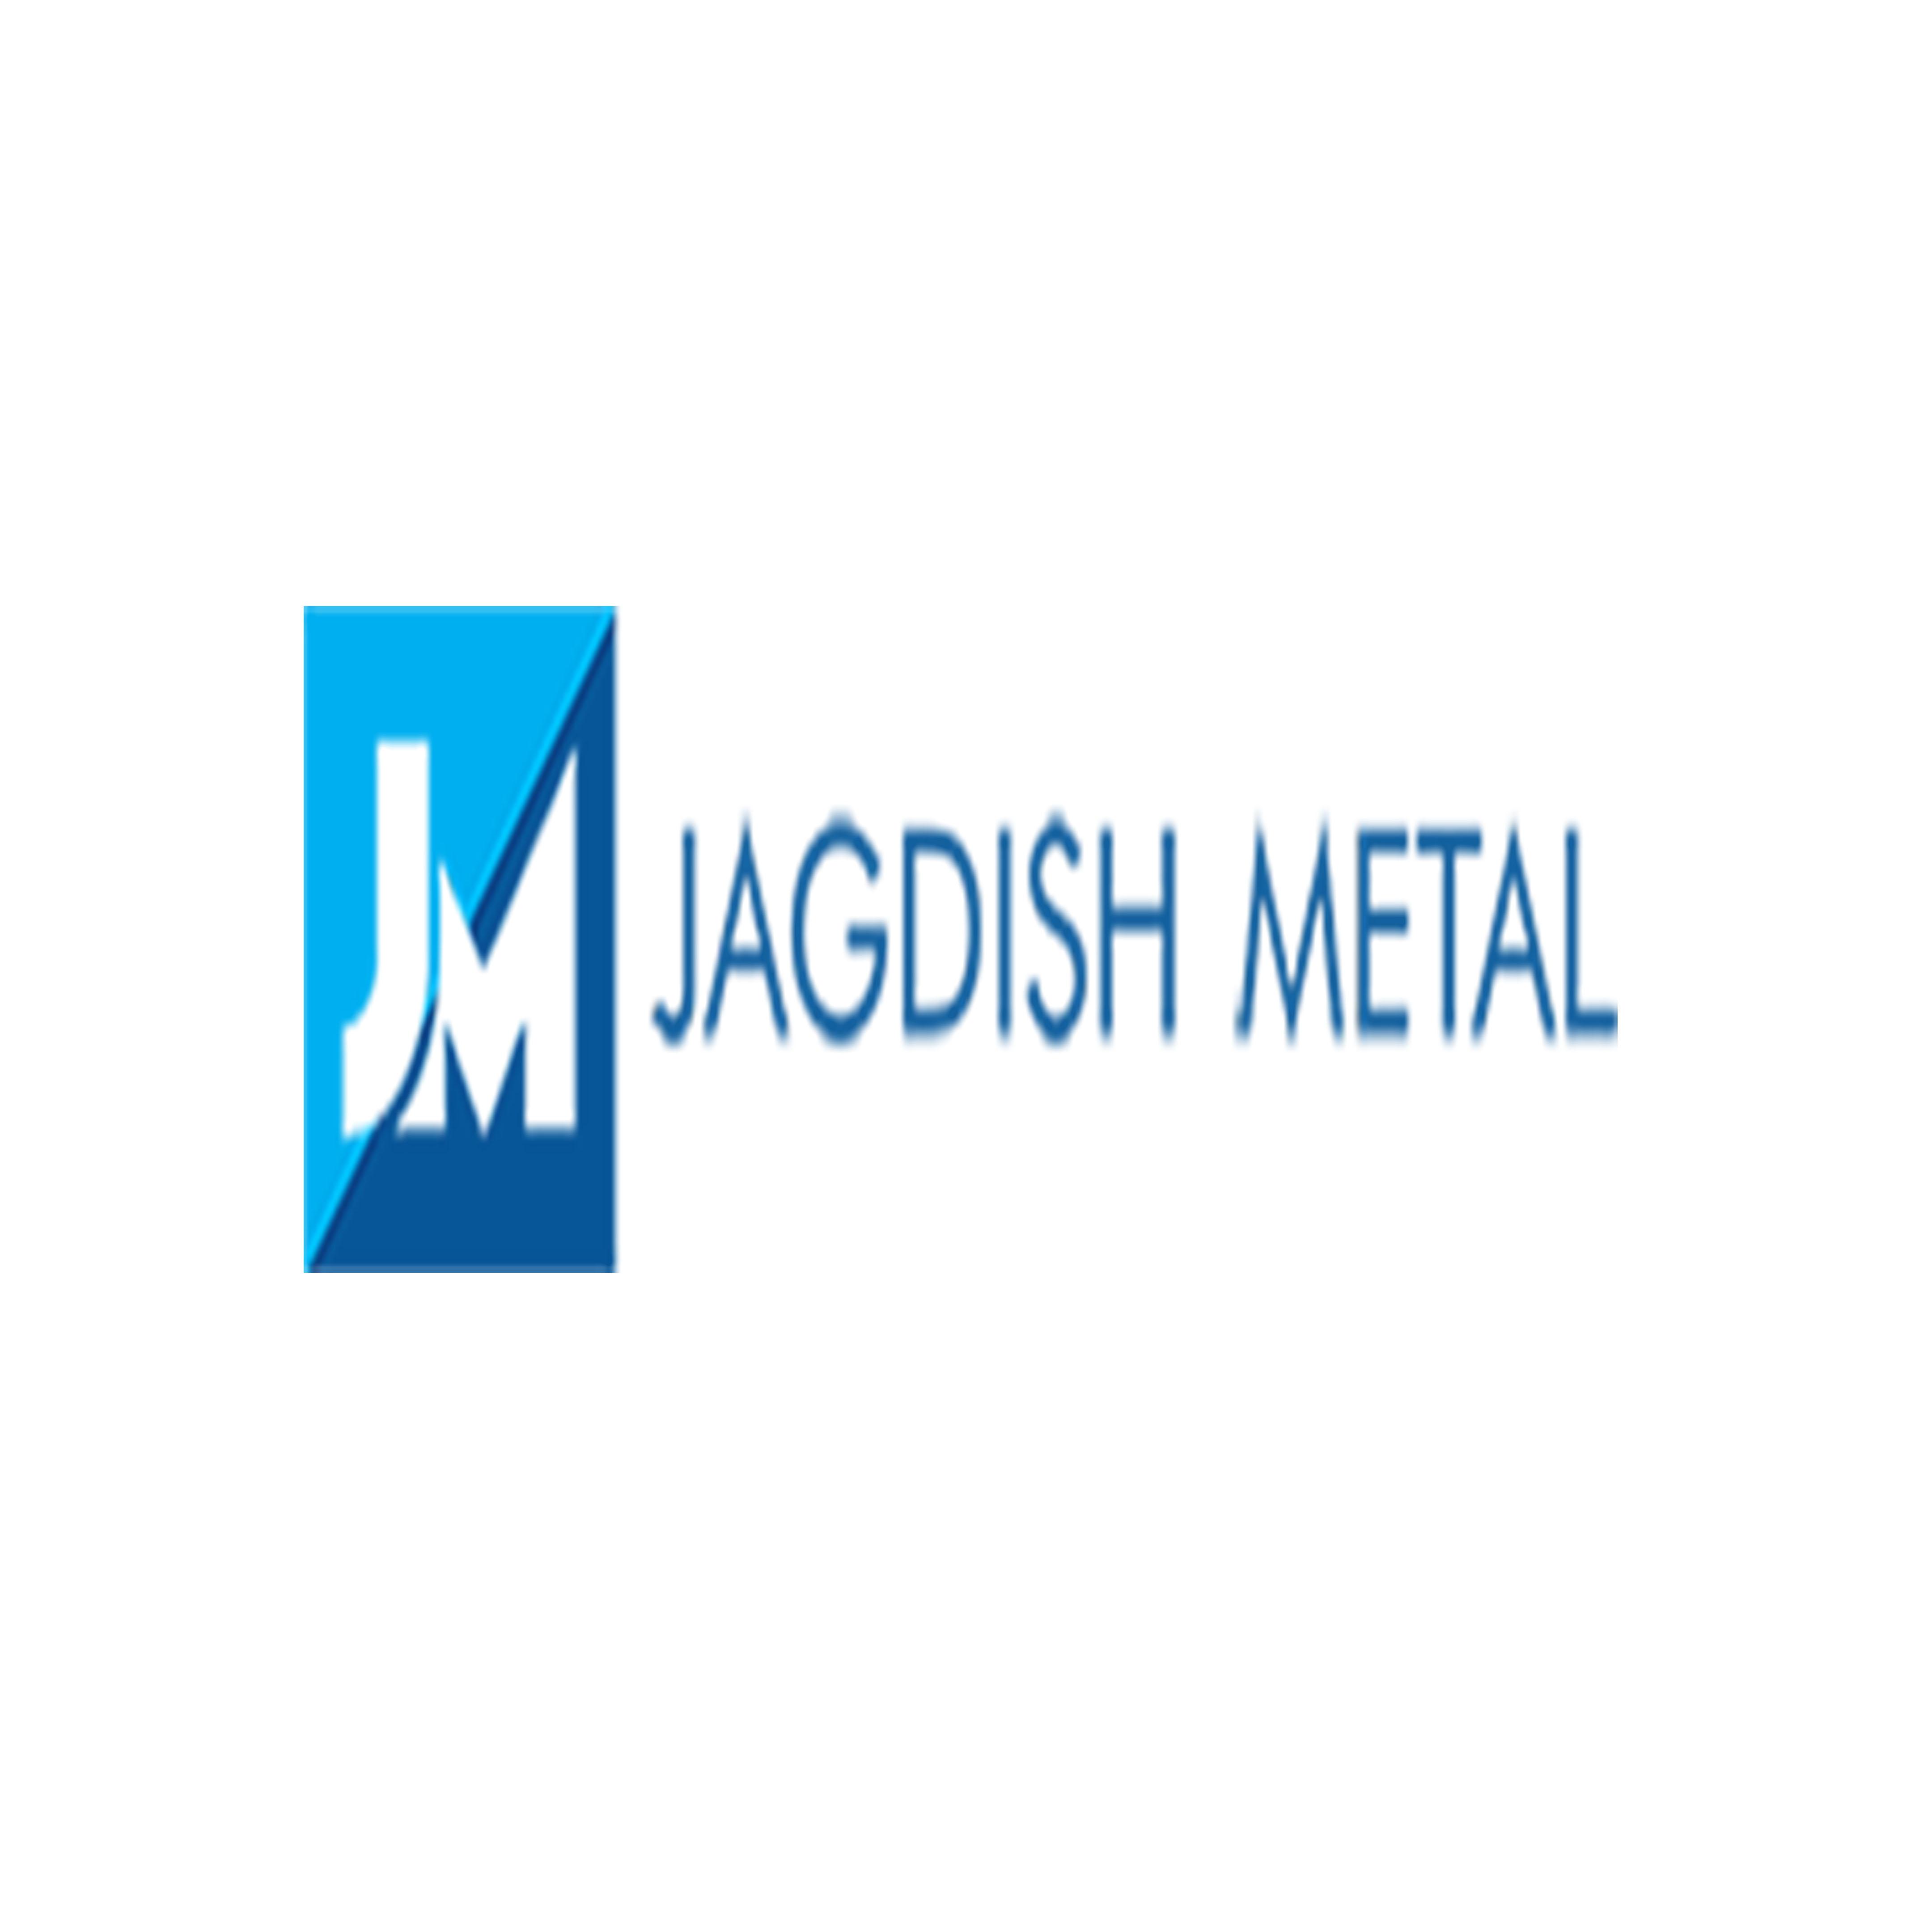 Jagdish Metal